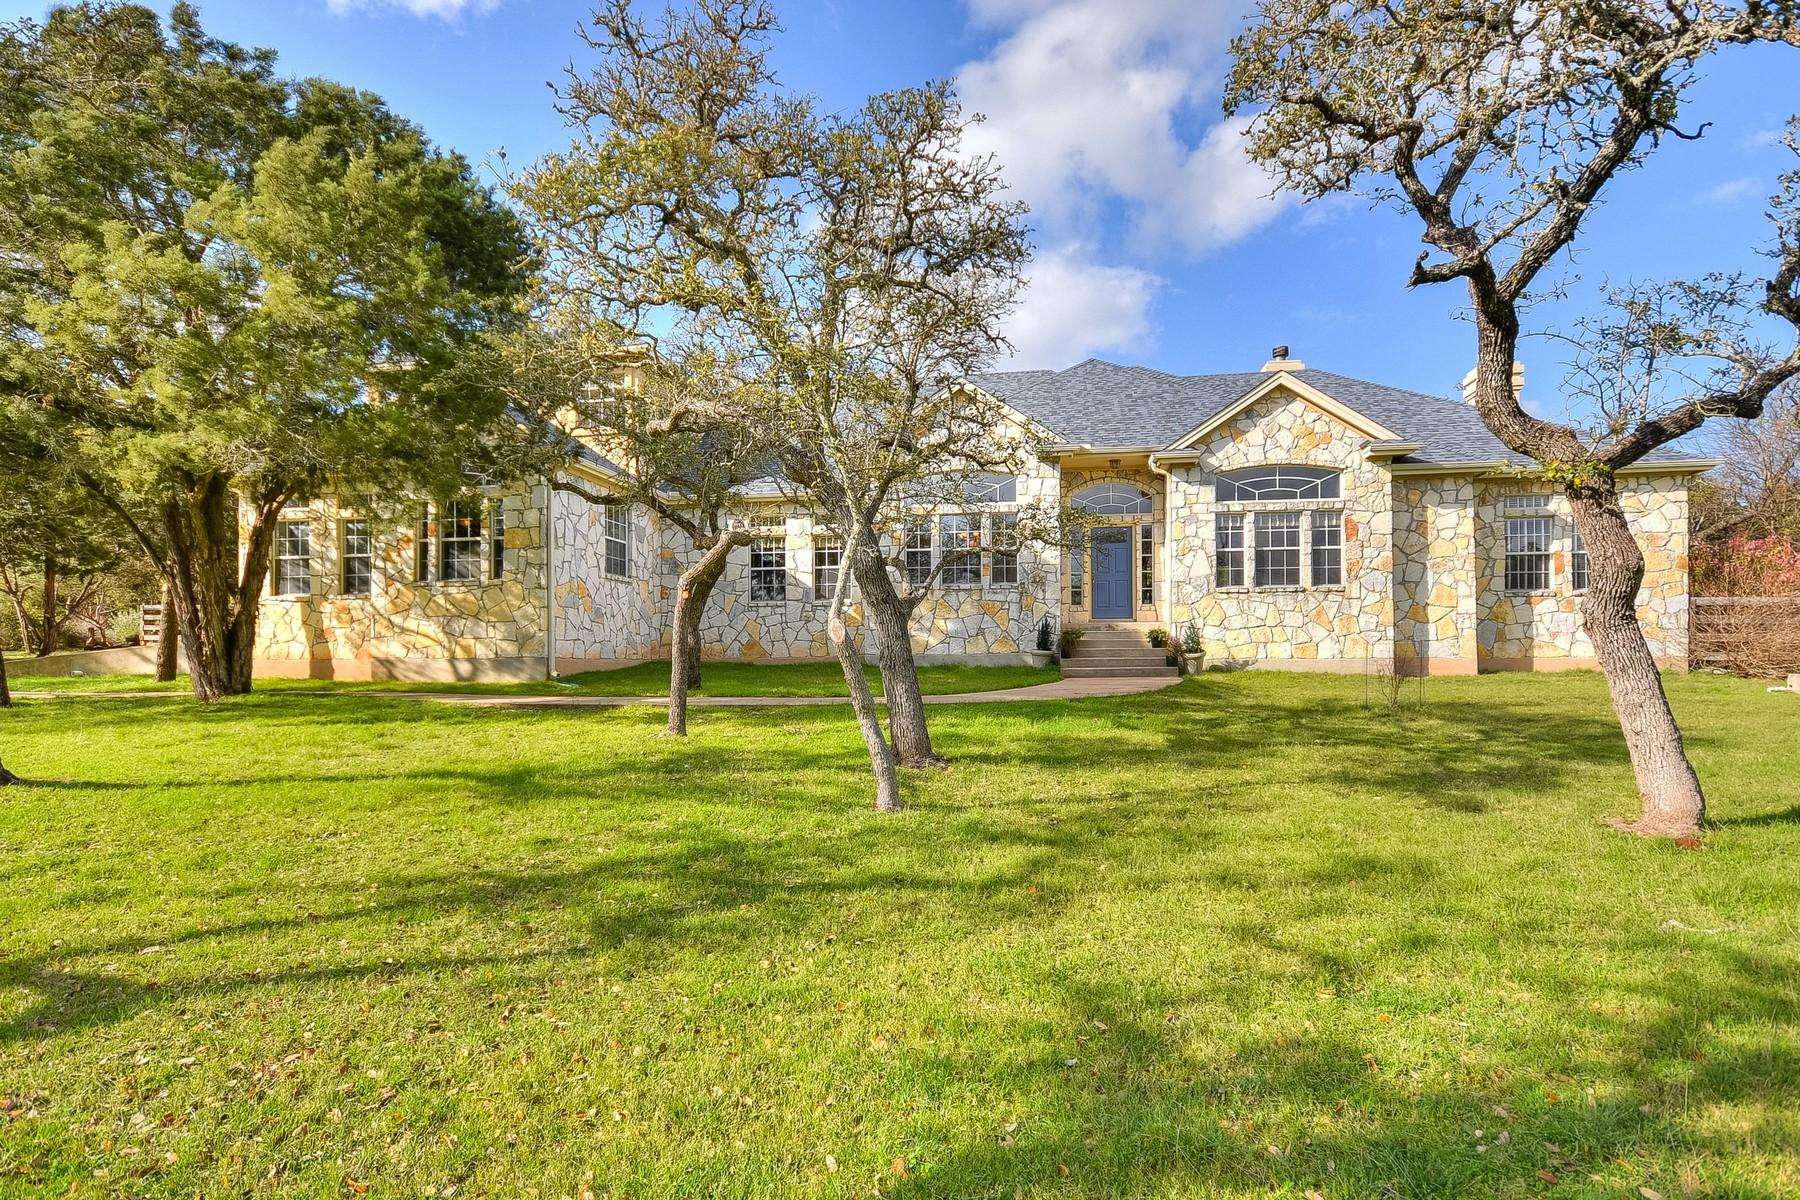 Casa Unifamiliar por un Venta en Fantastic Entertainer's Home 500 Winchester Dr Dripping Springs, Texas 78620 Estados Unidos